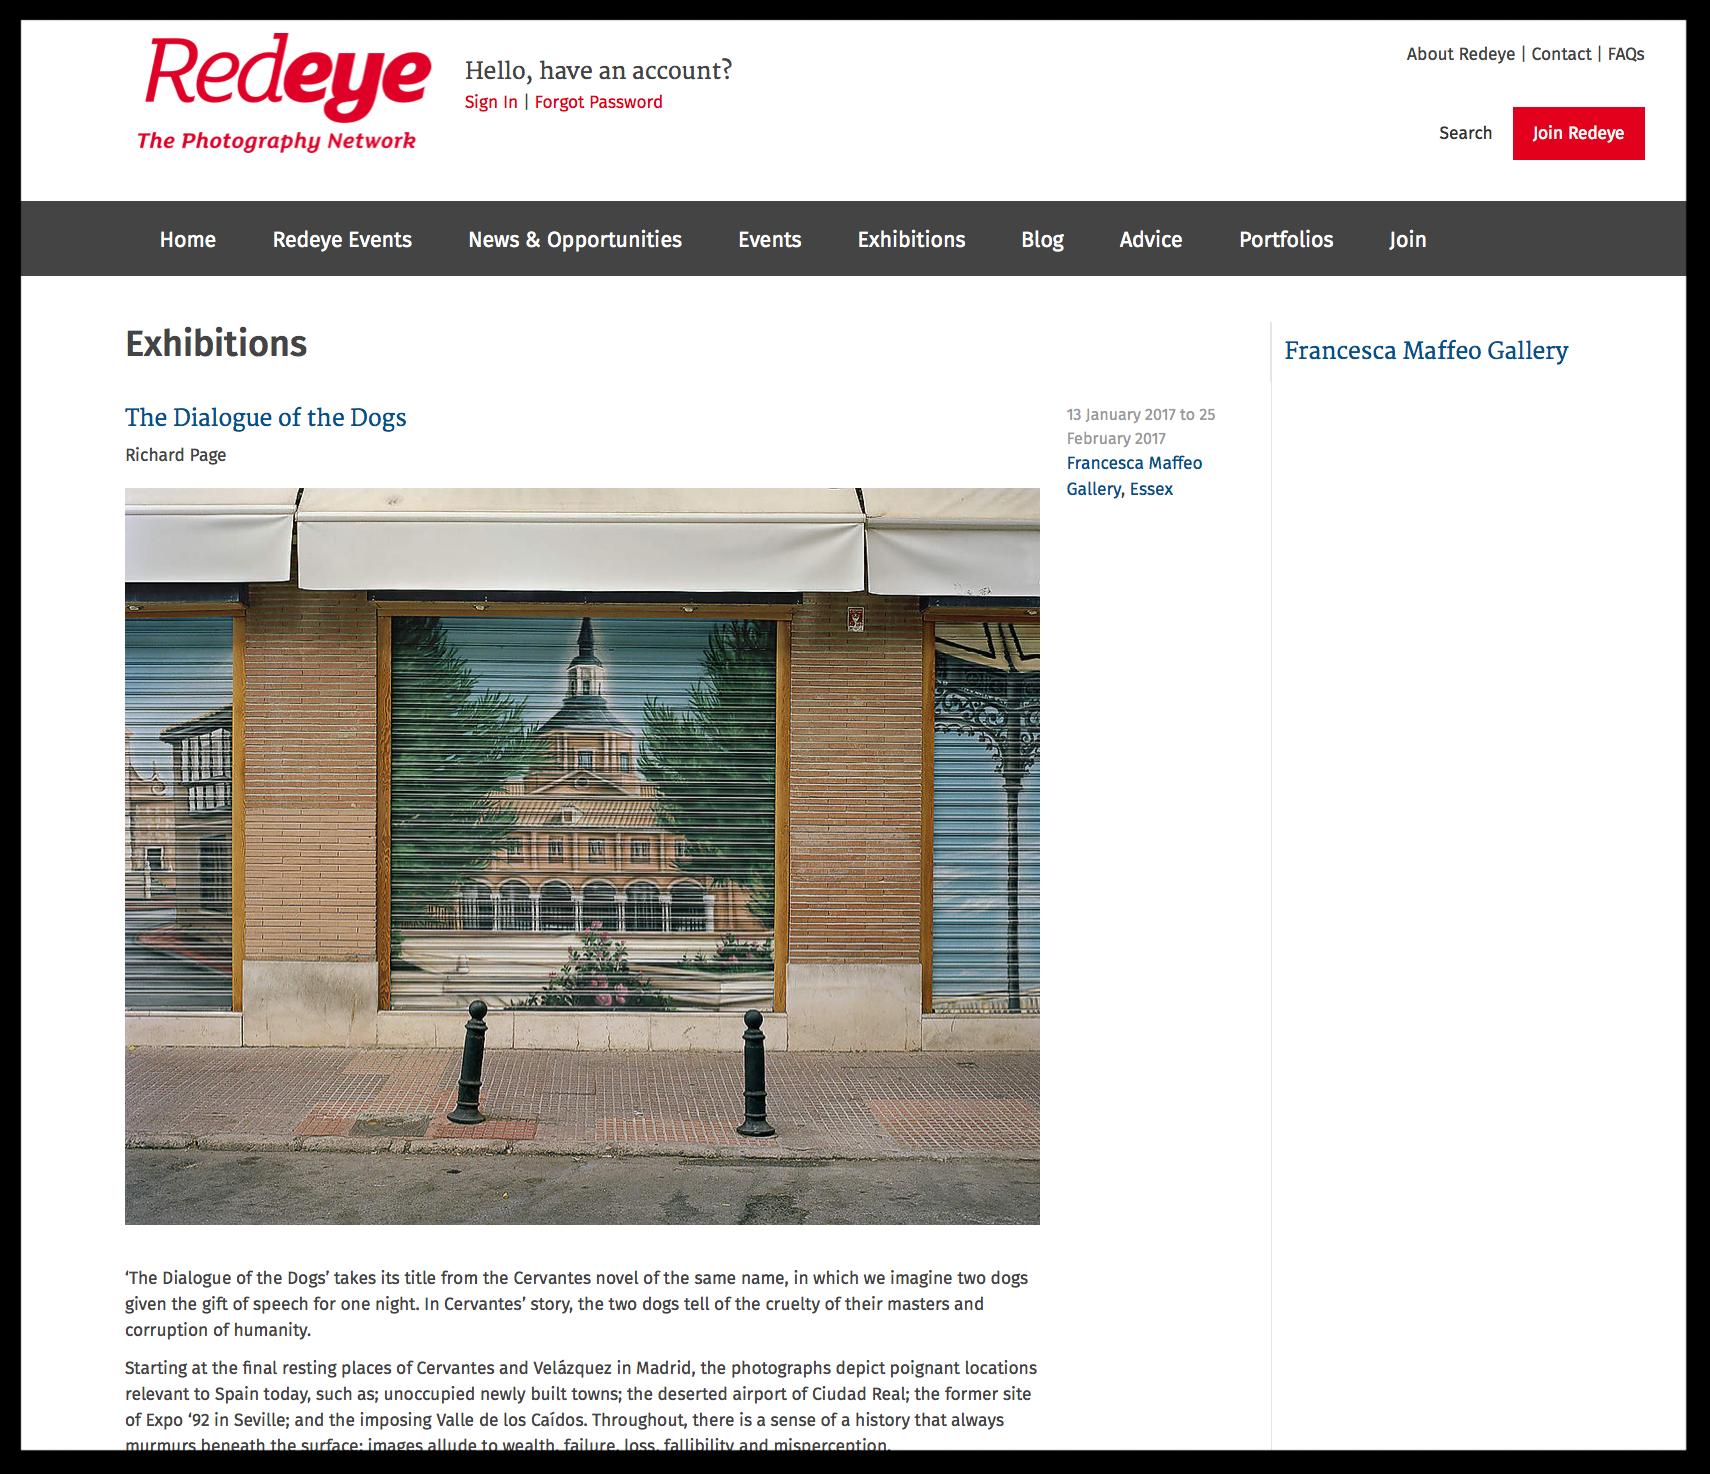 Redeye Network